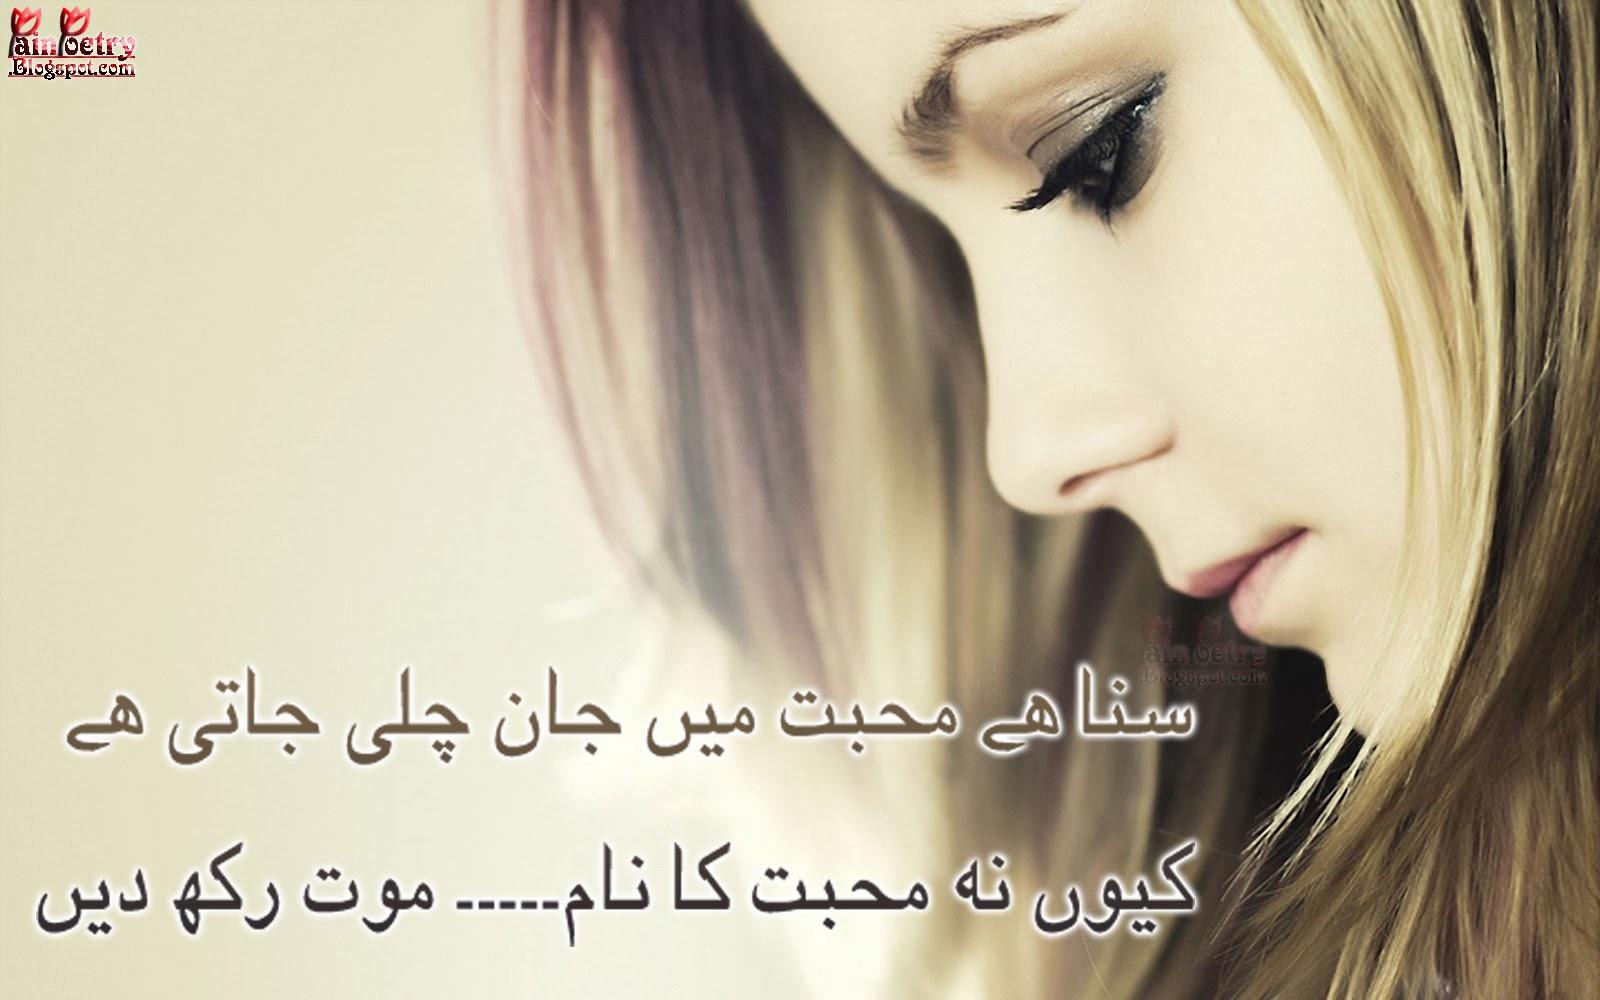 Sad-Girl-In-Love-Image-Suna-Hy-Muhabbat-Mein-Jaan-Chali-Jati-Hy-Kiun-Naan-Muhabbat-Ka-Naam-Moot-Rakh-Dein-Image-HD-Wide